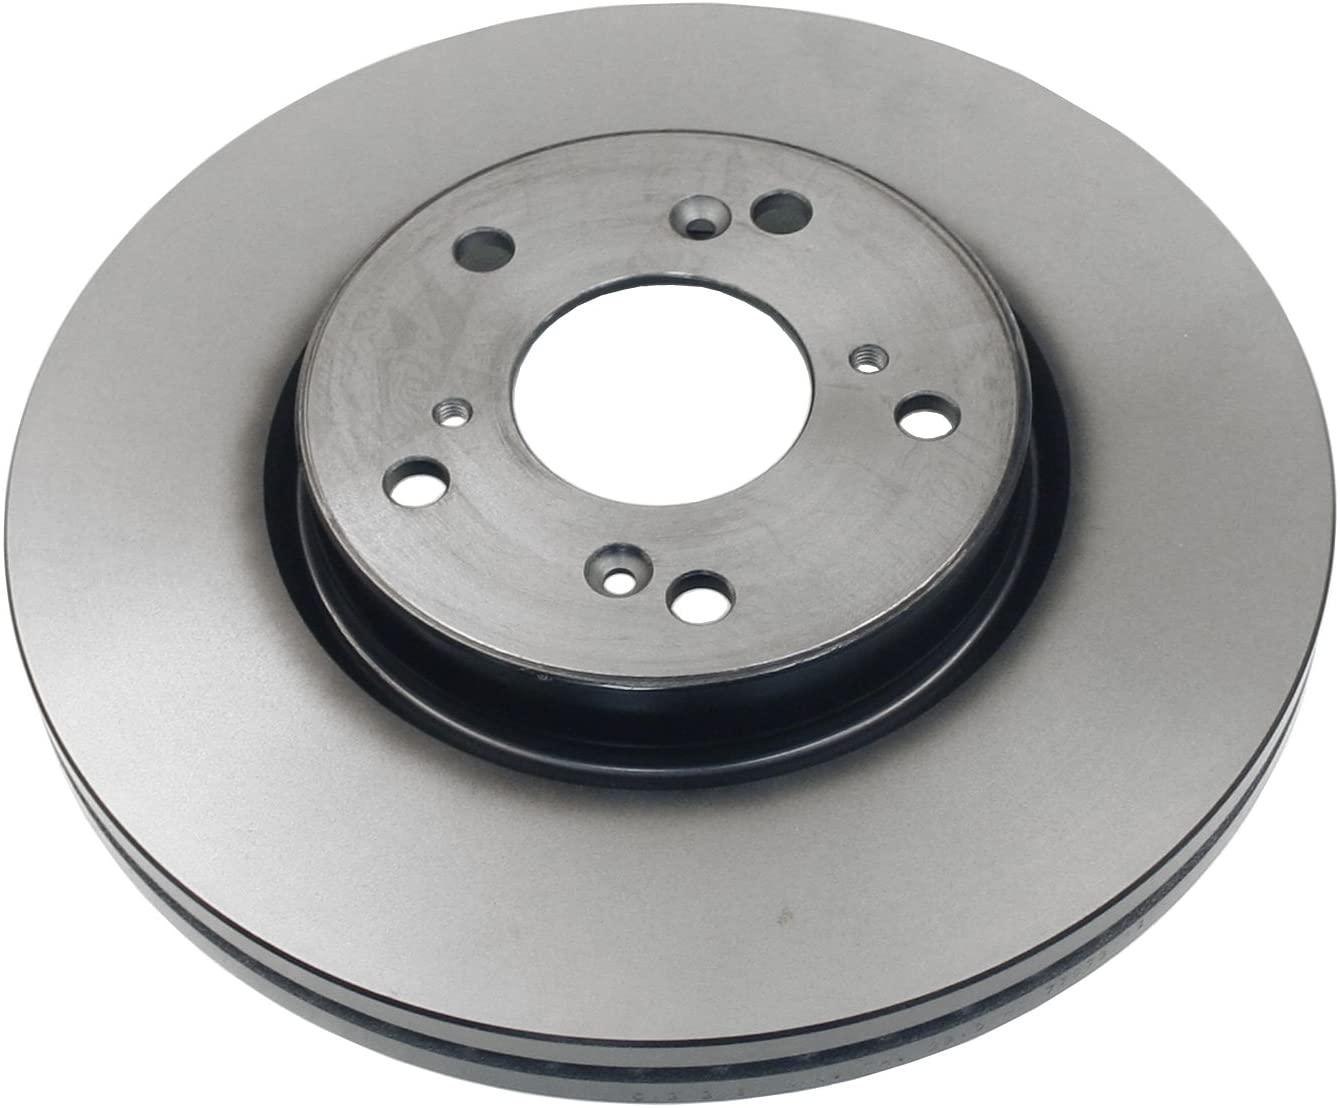 BECKARNLEY 083-3661 Premium Brake Disc, 1 Pack